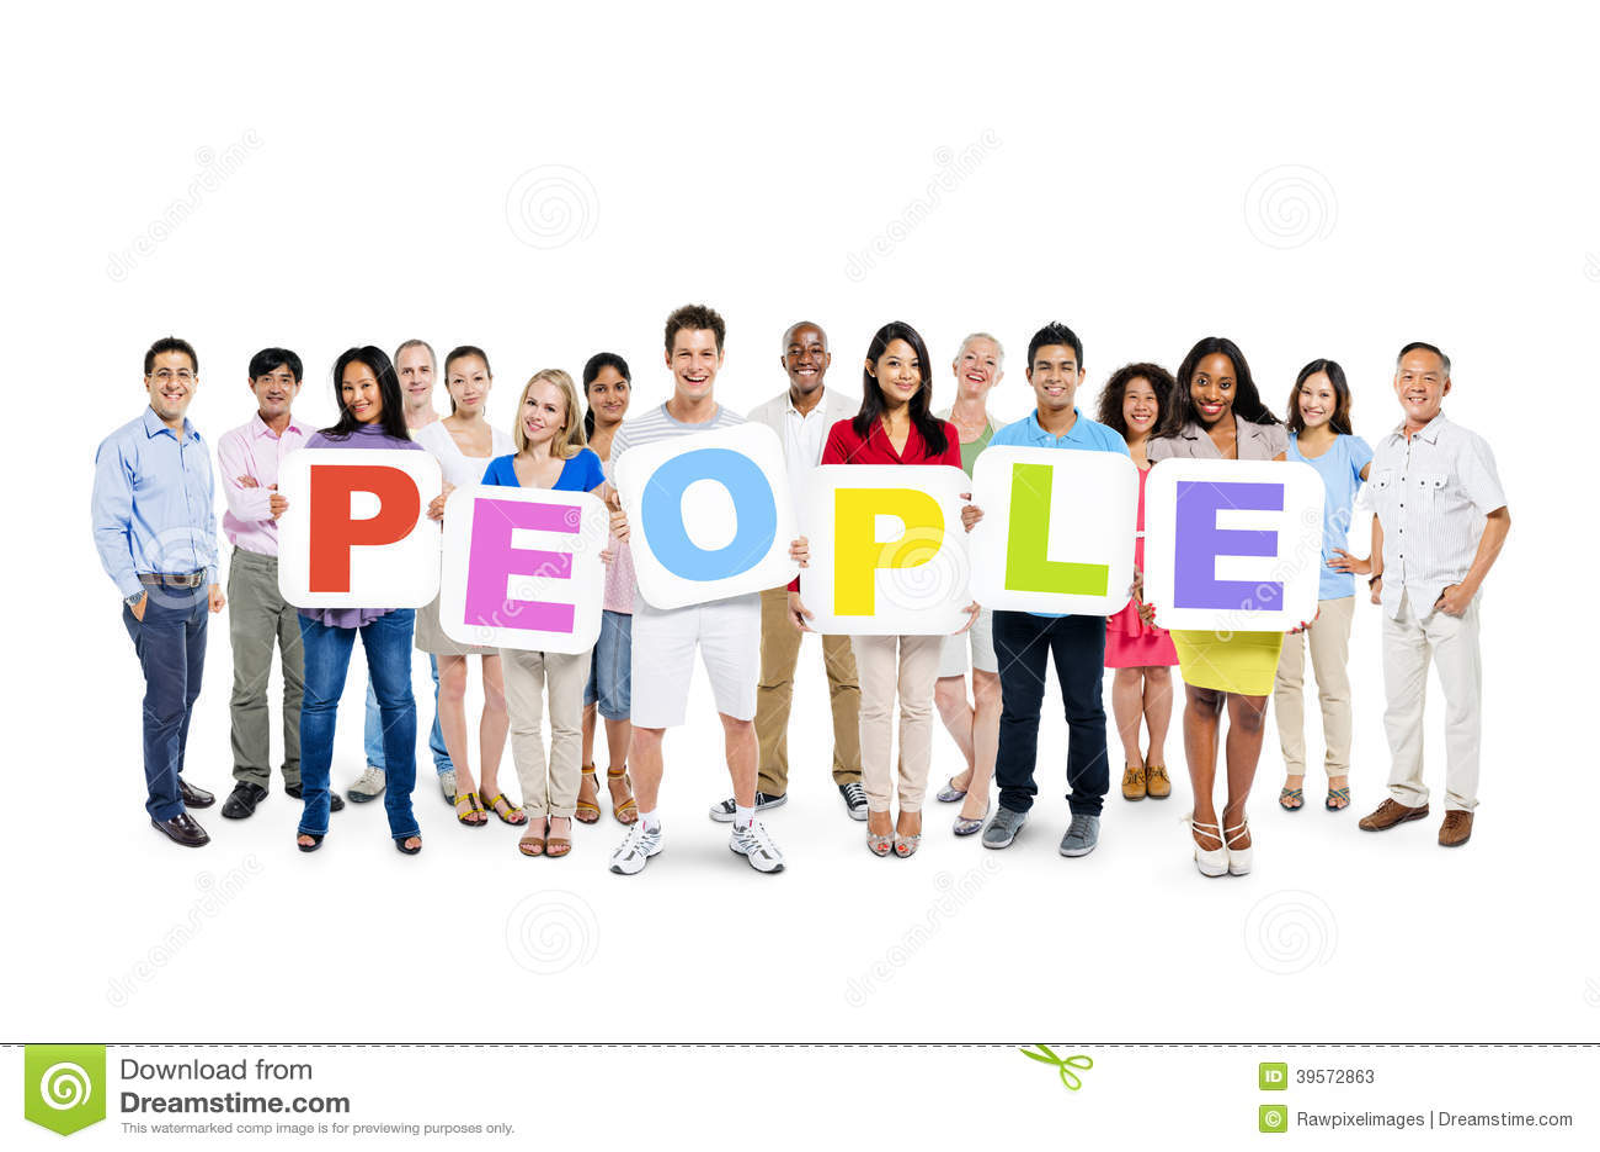 word mensen holding leute povos gente diverse wort bunte verschiedene halten kleurrijke mensenholding guardam coloridos diversos palavra letters palabra colorida